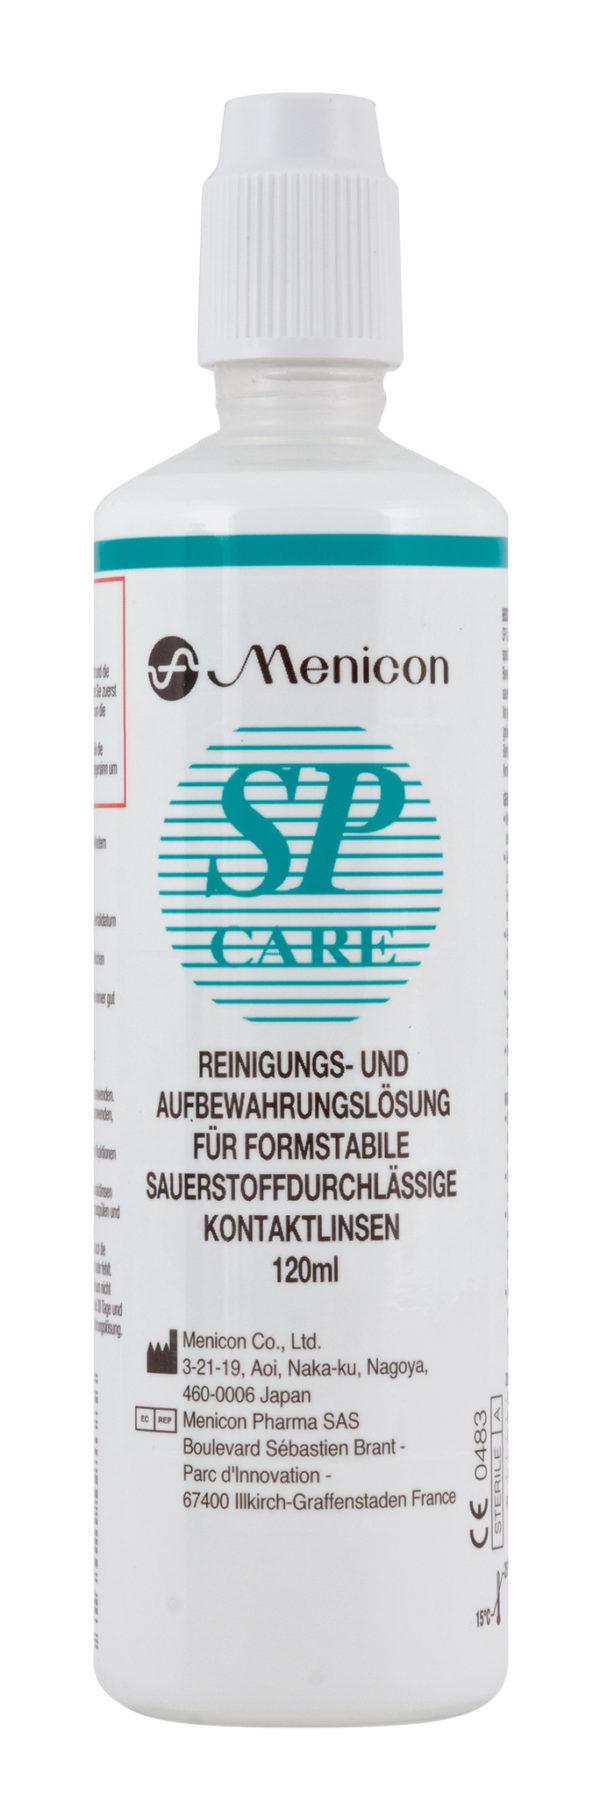 SP CARE 120ml 600x1816 - Menicon SP Care